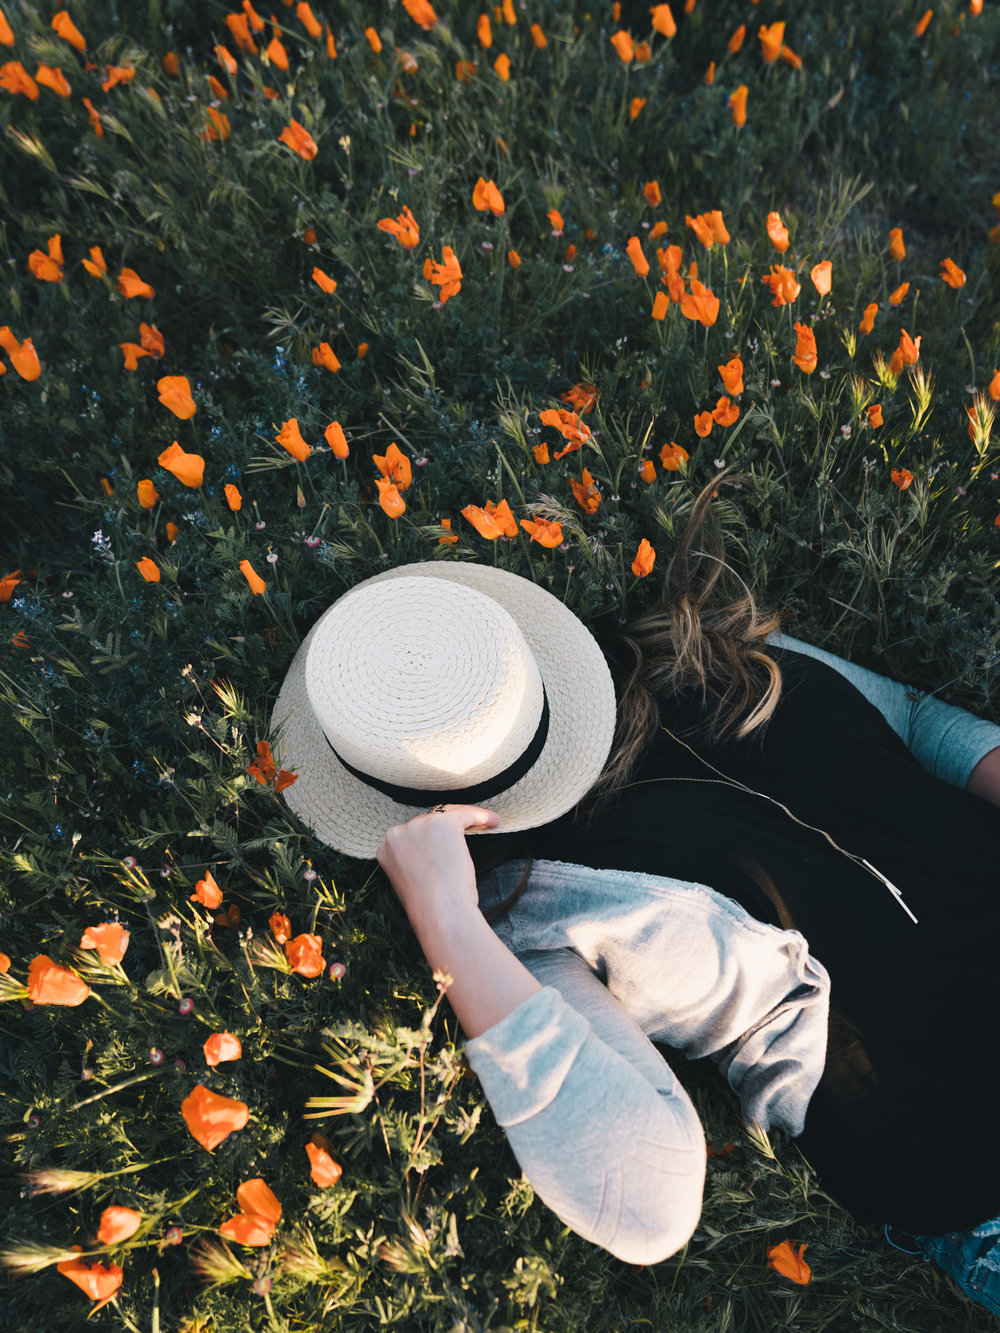 Tara  |4.4.17| Antelope Valley Poppy Reserve, California